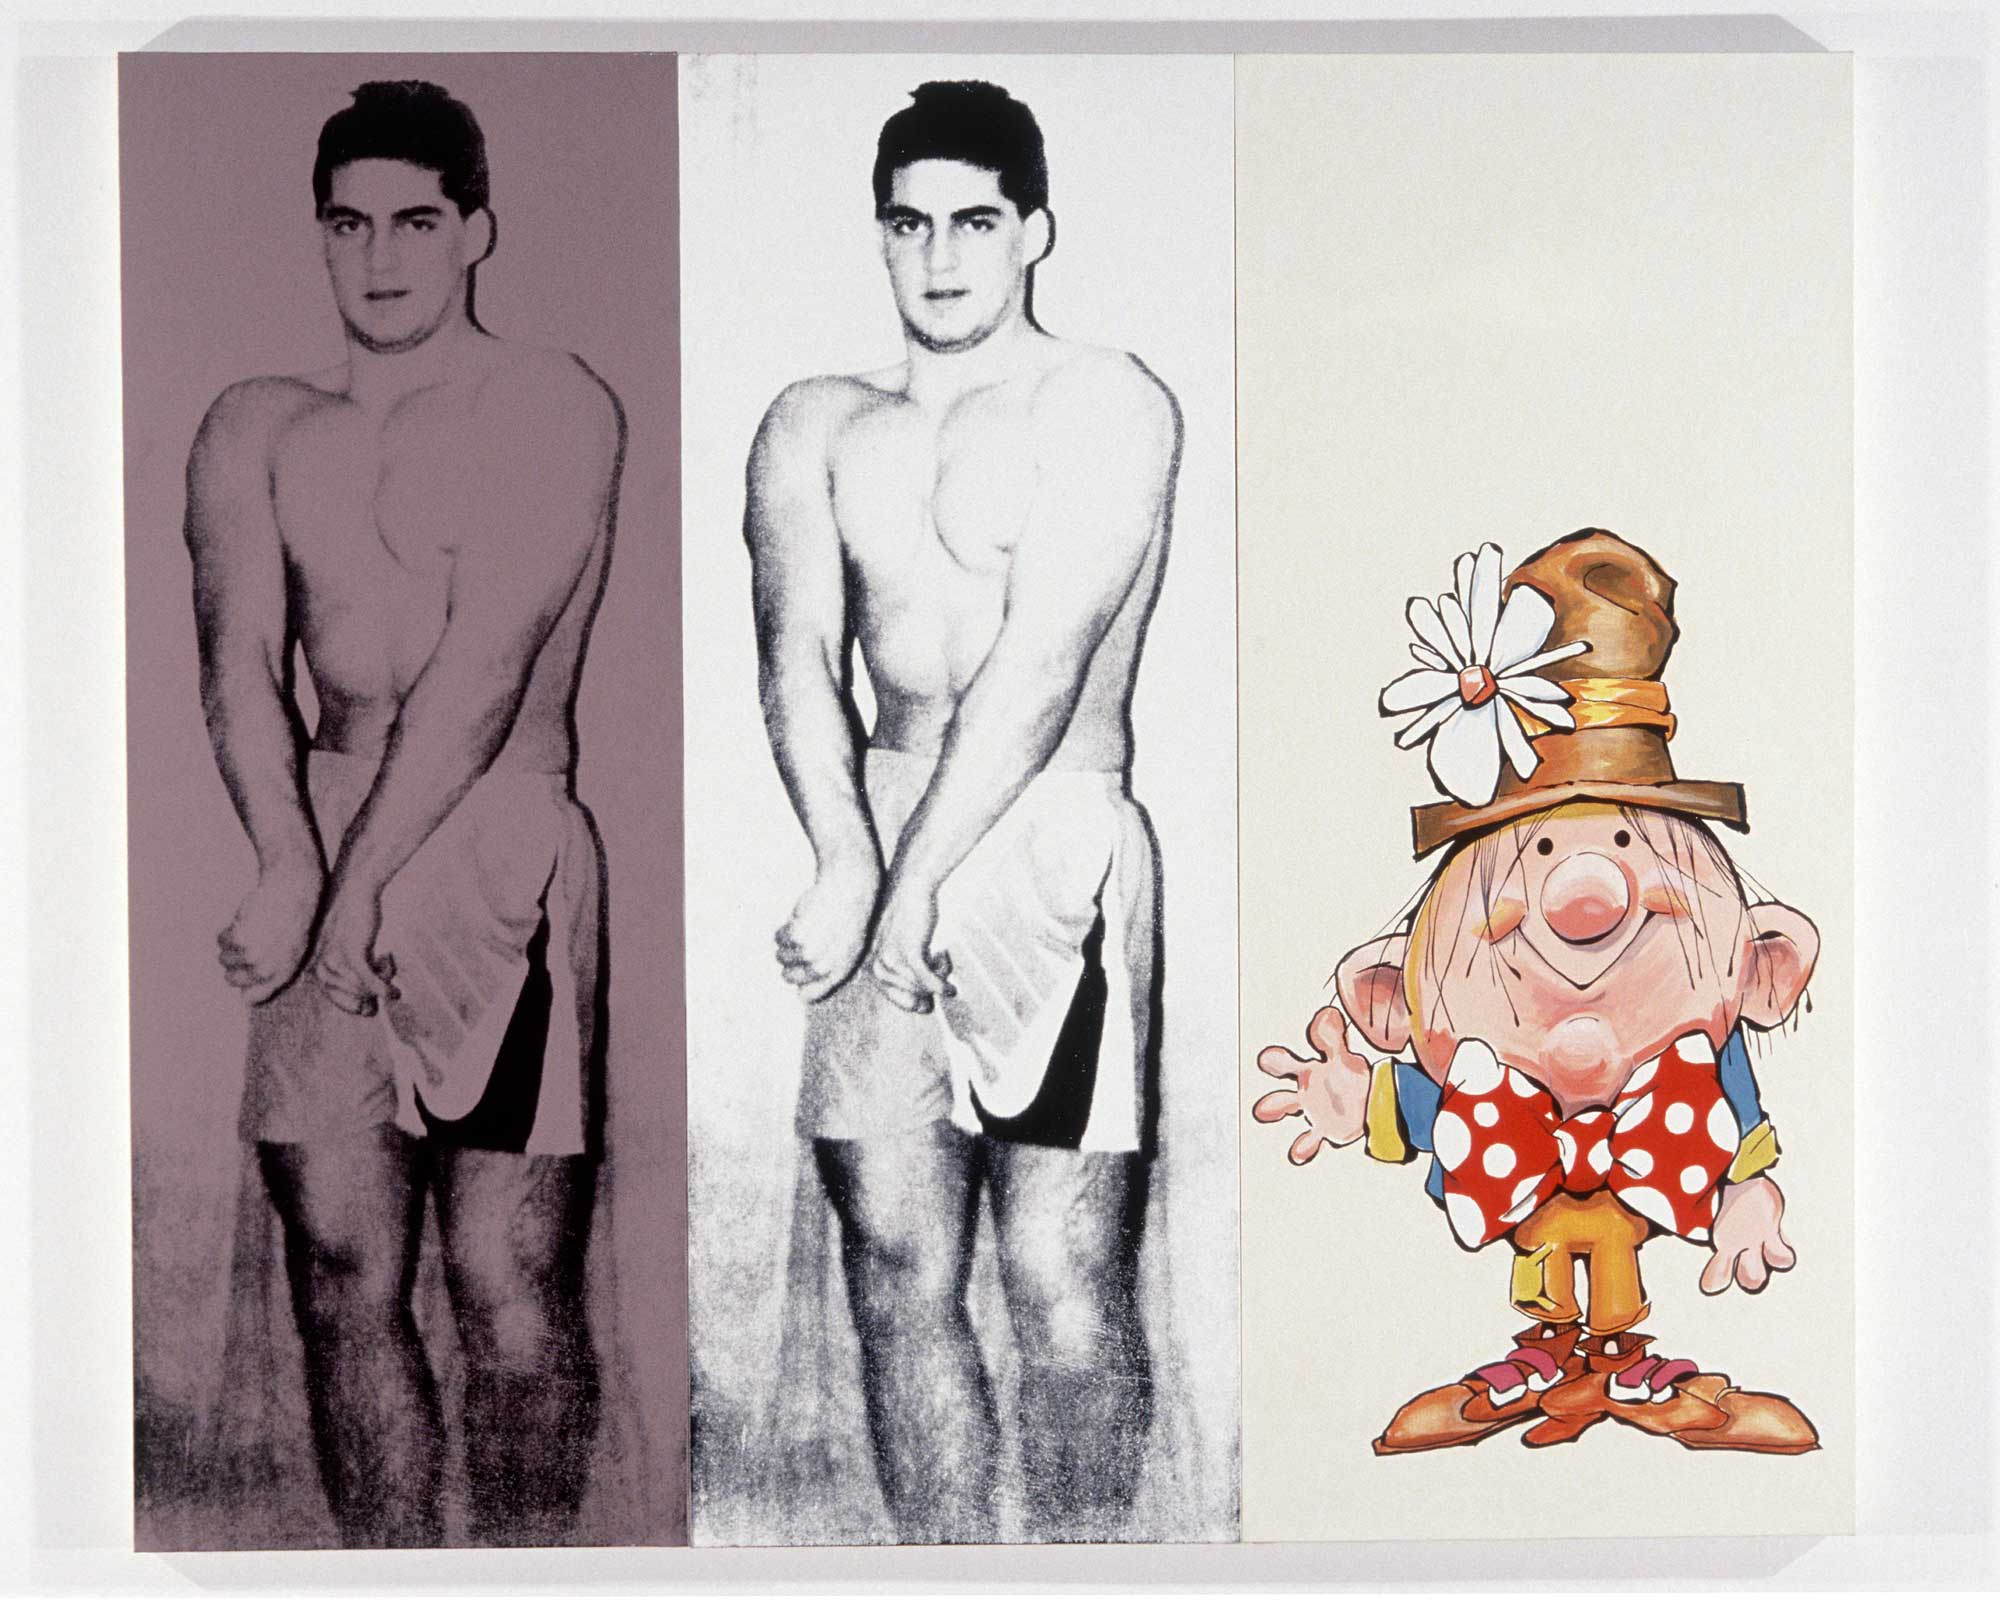 Julia Wachtel, Untitled (Body Builder), 1989. Courtesy the artist, Zabludowicz Collection, and Vilma Gold, London